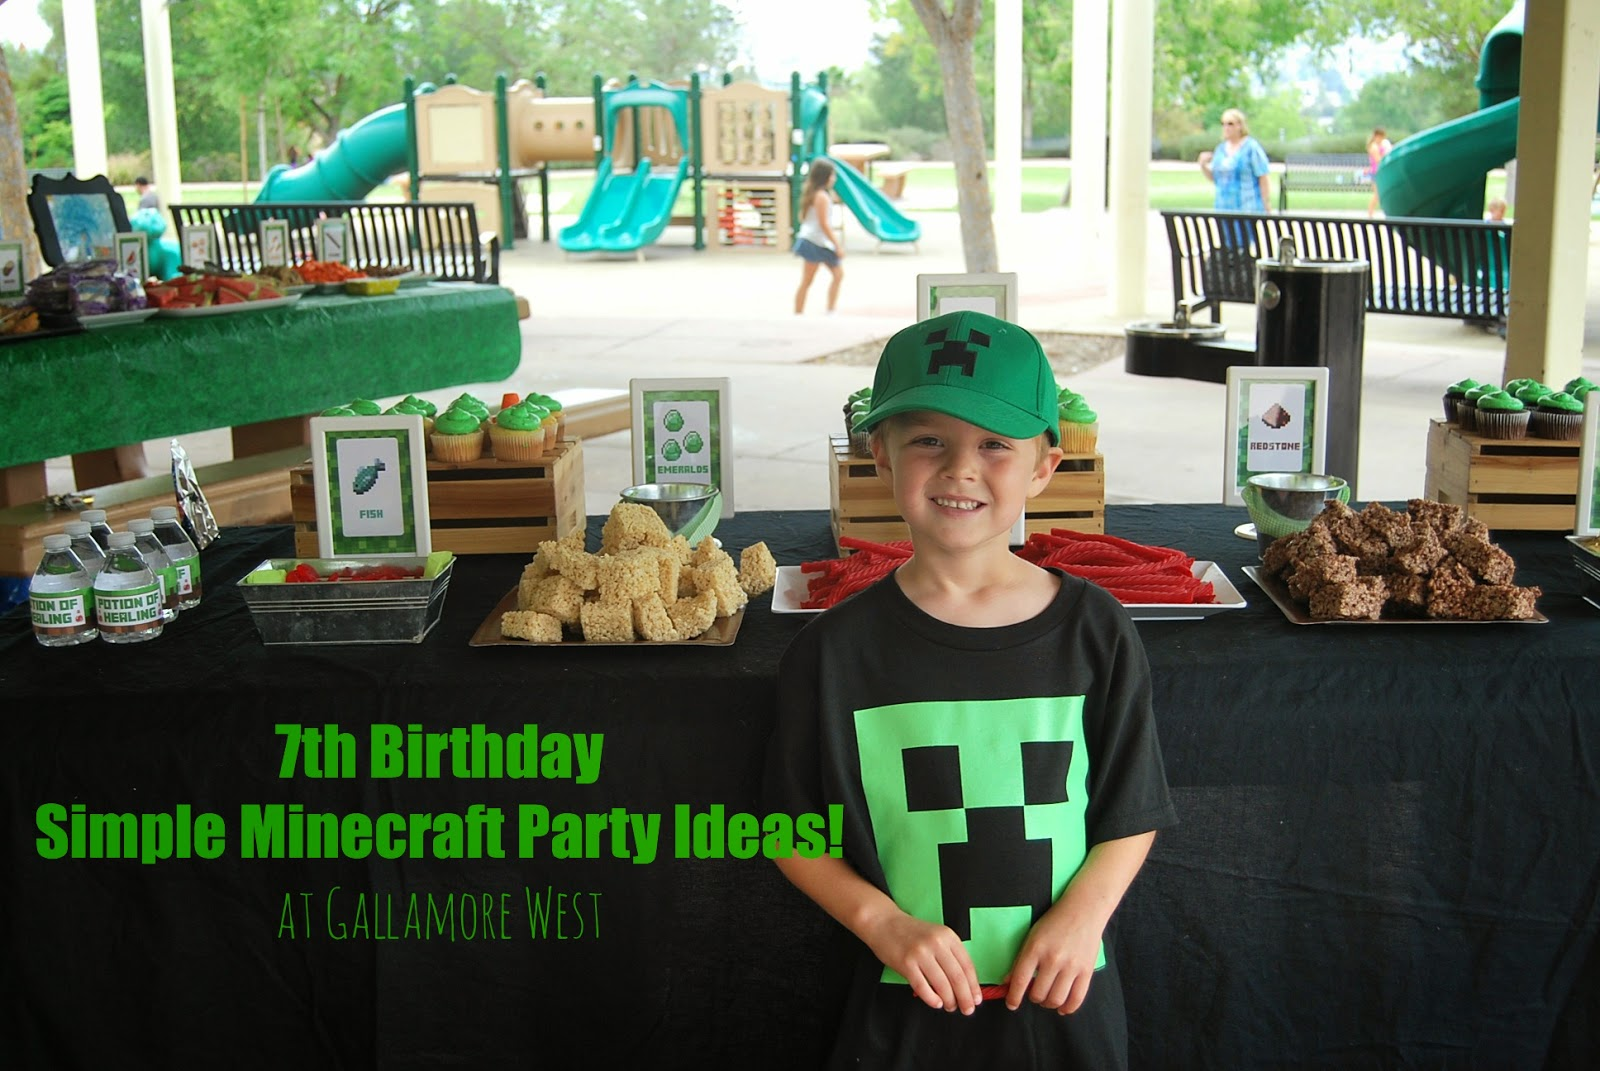 Minecraft Party Ideas at www.gallamorewest.com